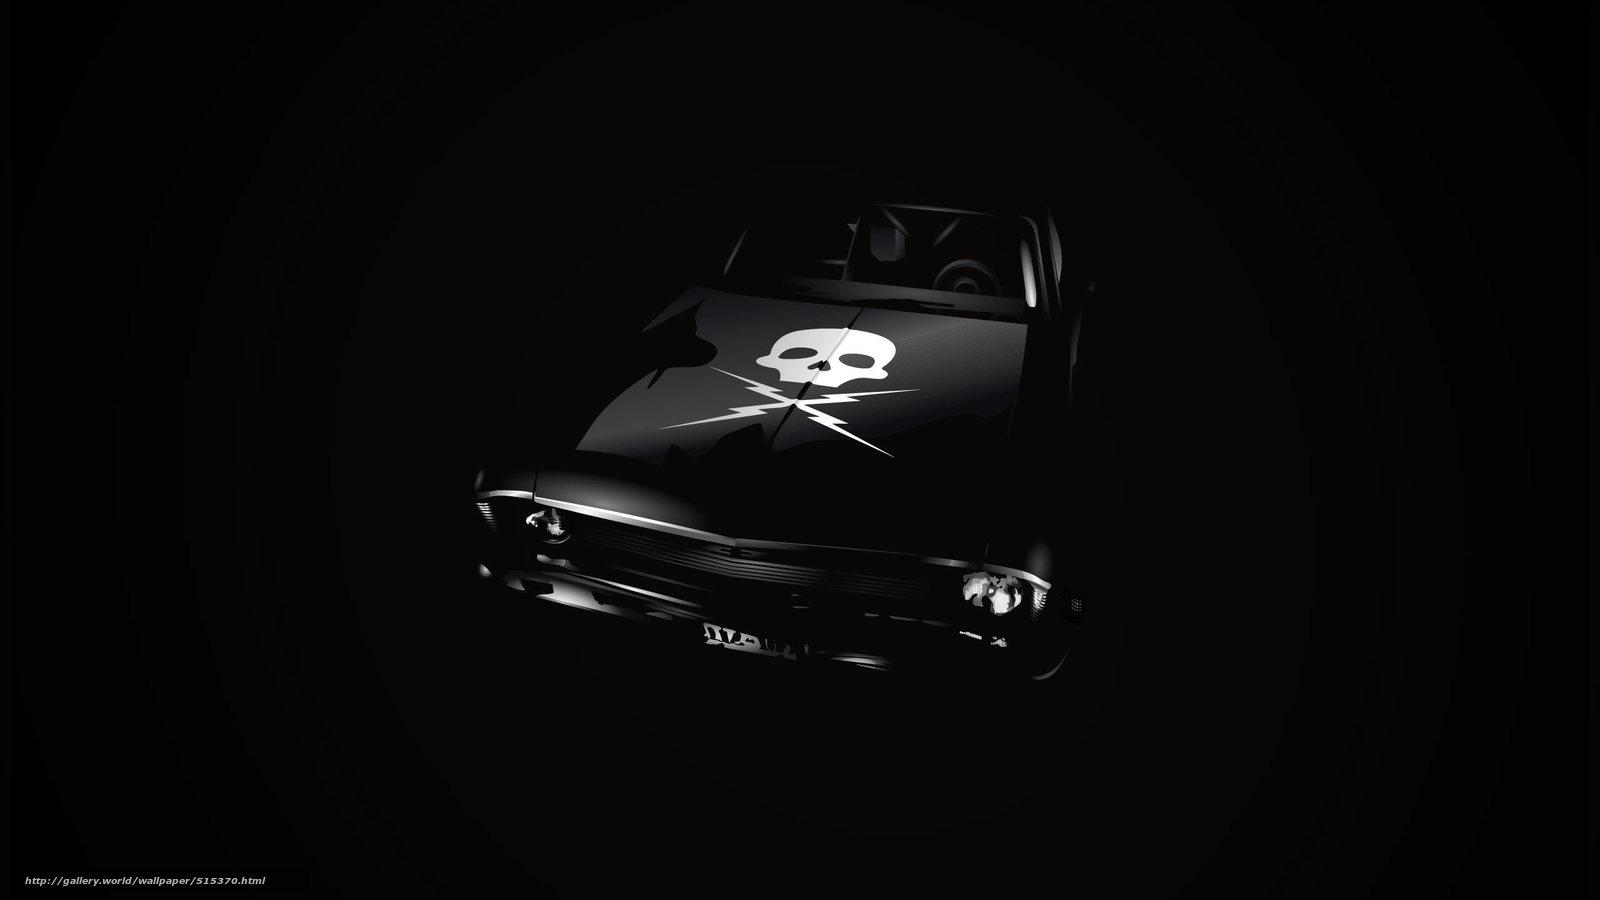 Download Wallpaper Black Background Chevrolet Death Proof Skull